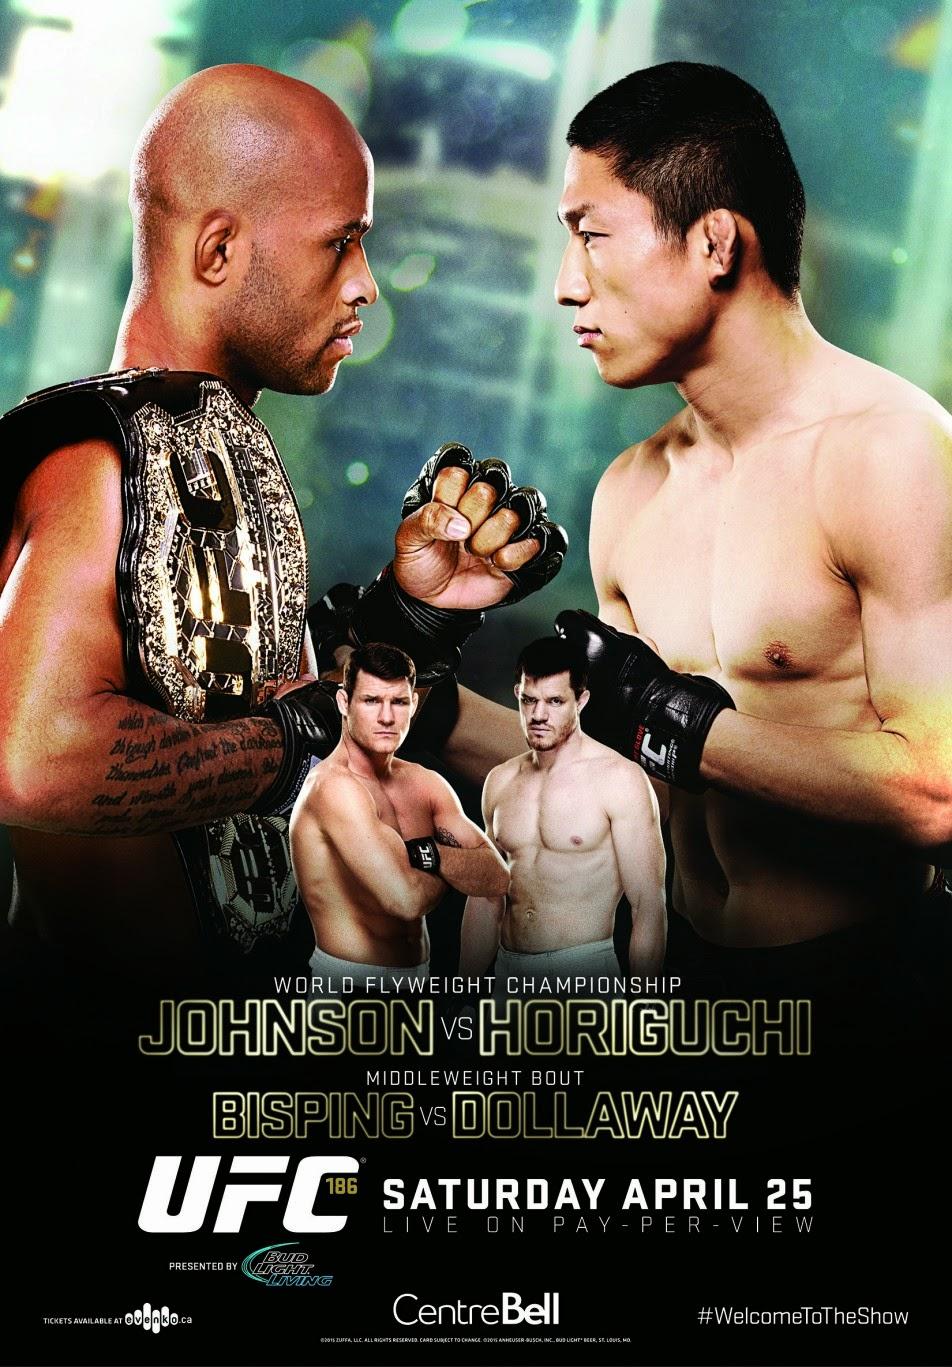 UFC Demetrious Johnson Kyoji Horiguchi fight